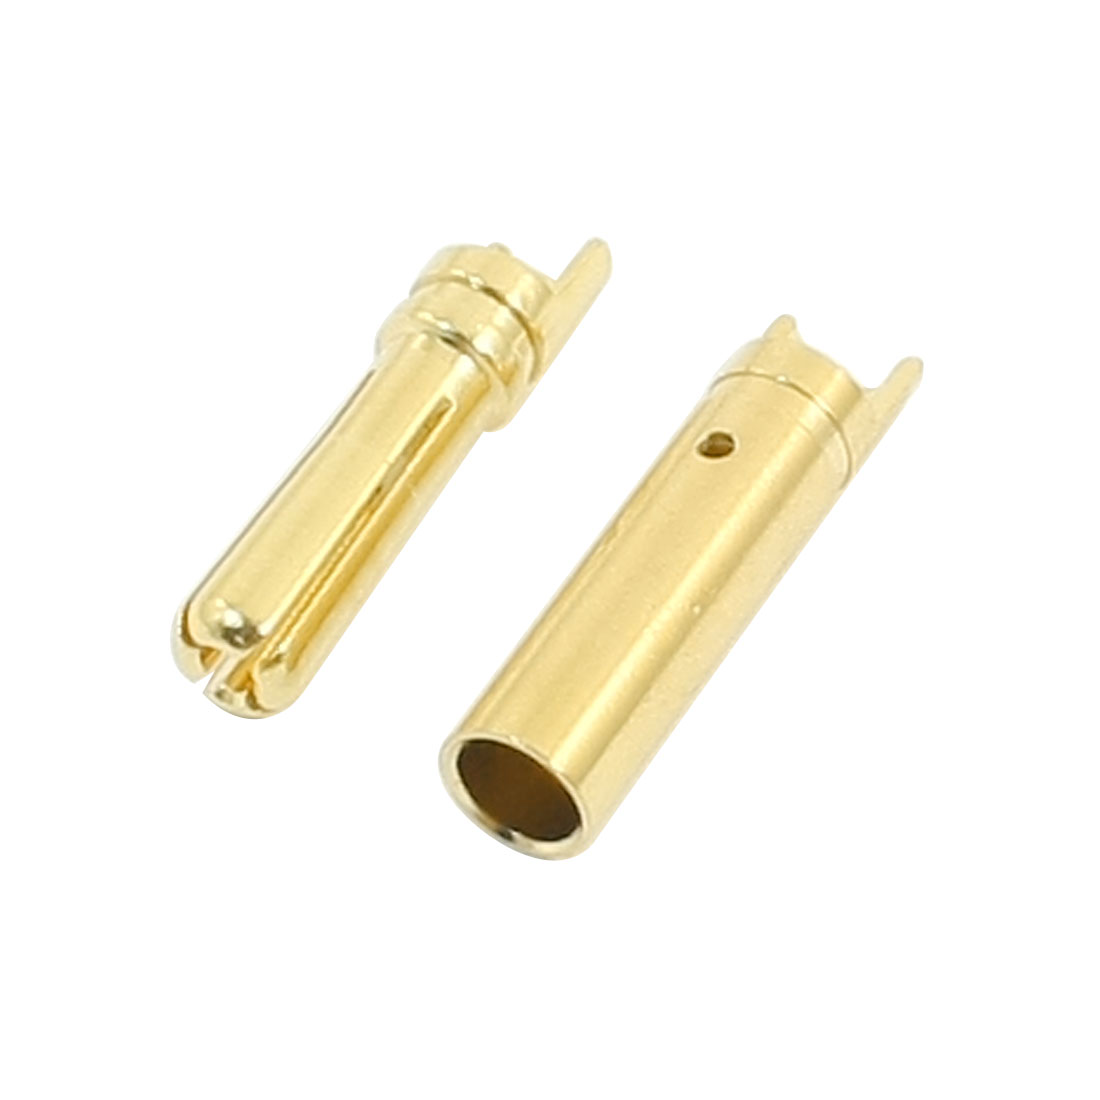 RC Model Brushless Motor Li-Po Battery Part Gold Tone Metal Male Female Banana Plug Connector Adapter 4mm Dia Pair